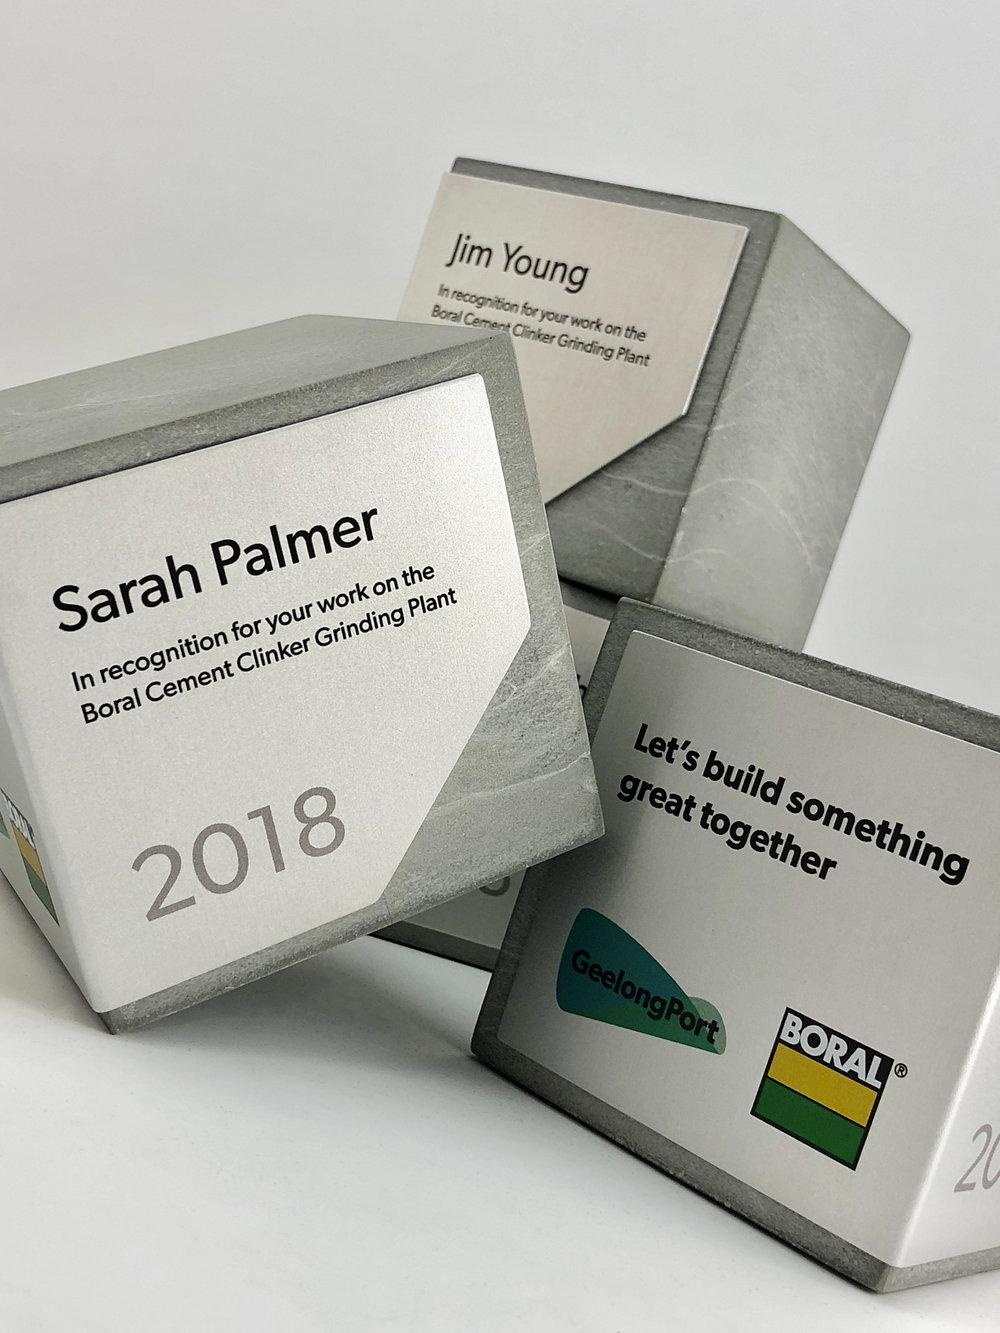 geelong-port-cement-cube-awards-trophy-02.jpg